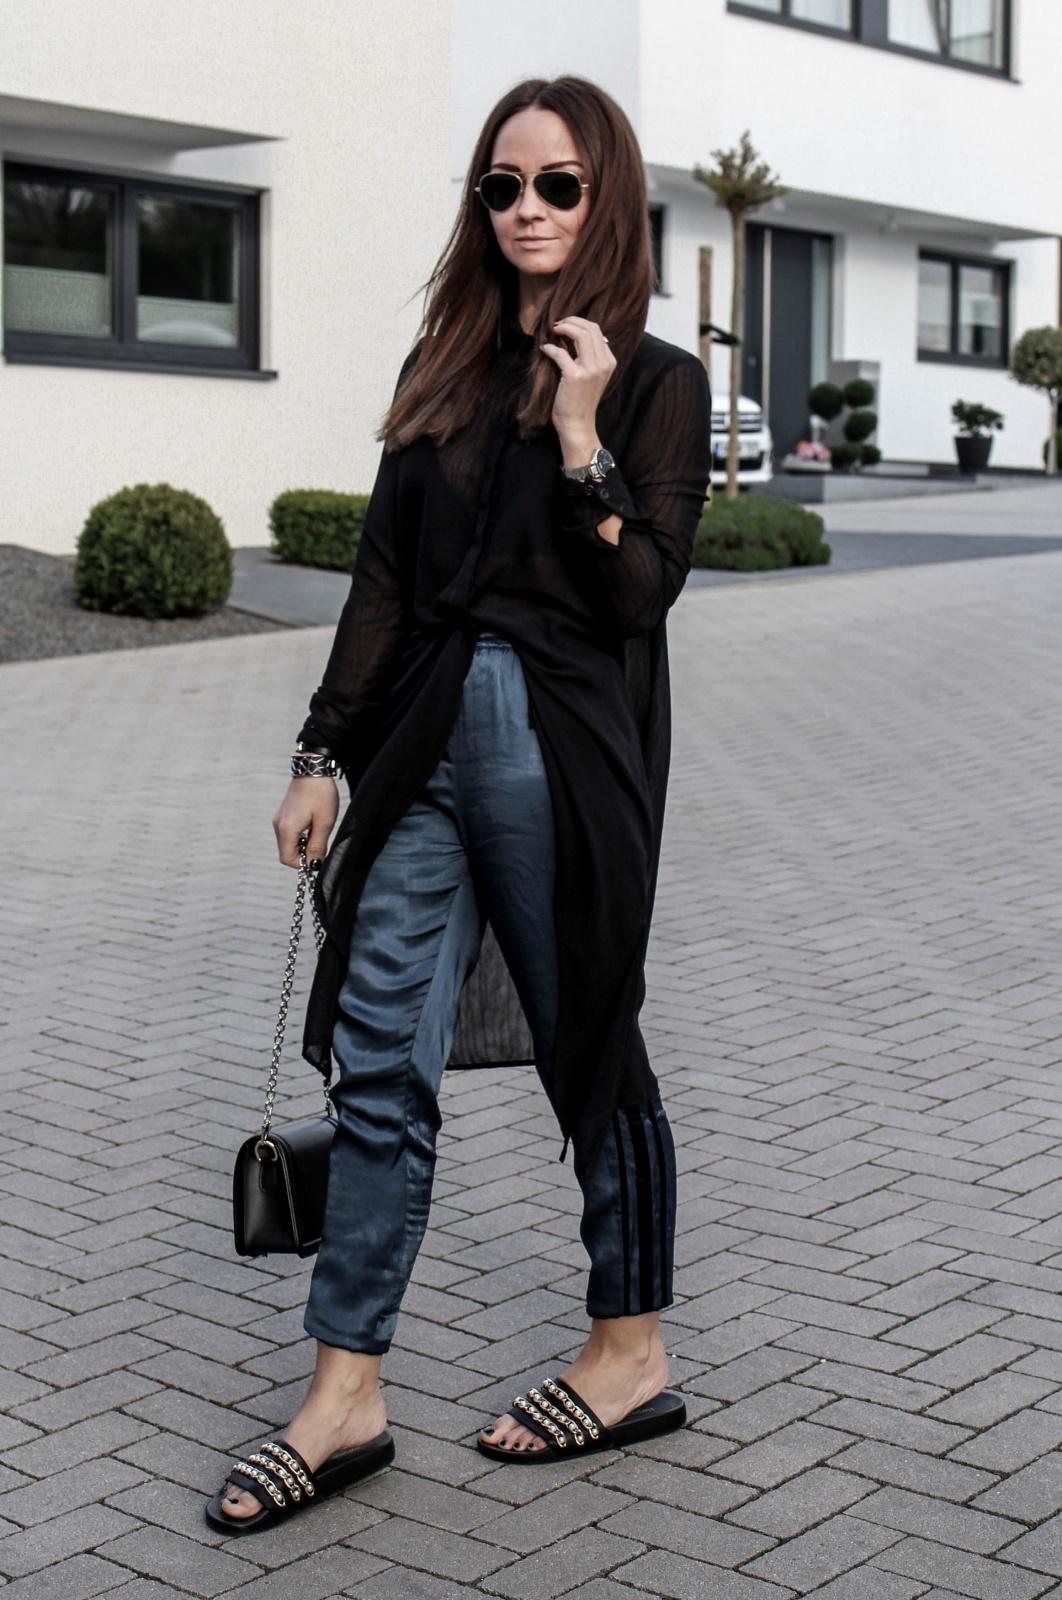 Fashioncircuz by Jenny dalli_caps_waschmittel_fashioncircuz_jennifer__blogger_perlen_portrait_trend_trendcheck-Kopie-4-1062x1600 Dalli Trendcheck II - PERLEN